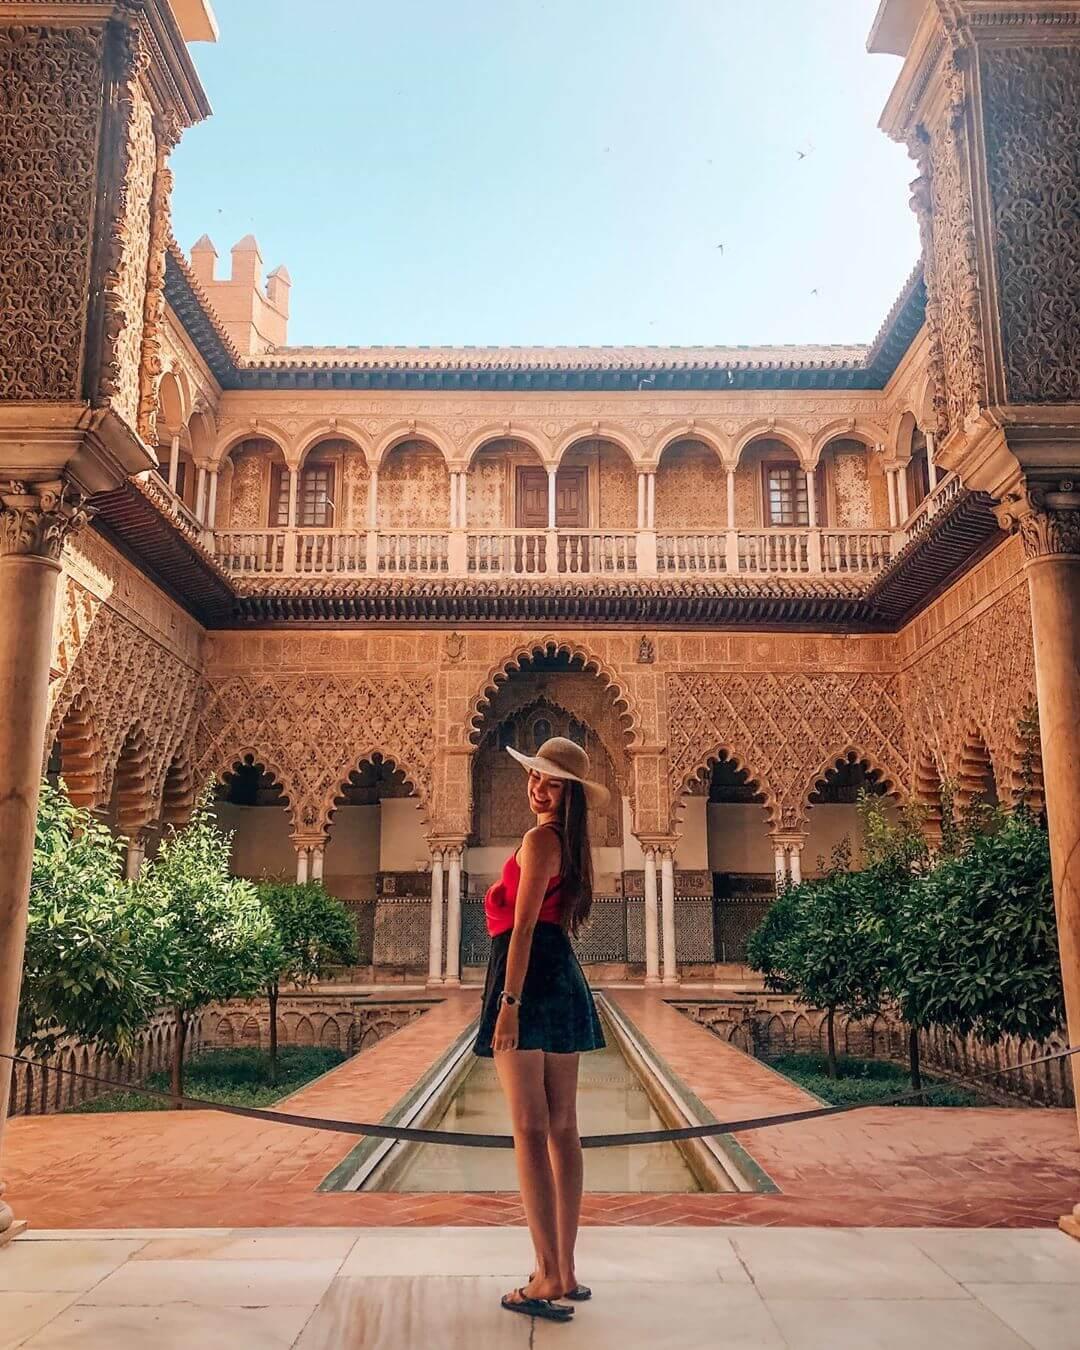 La fortaleza árabe del siglo XI, o Alcázar